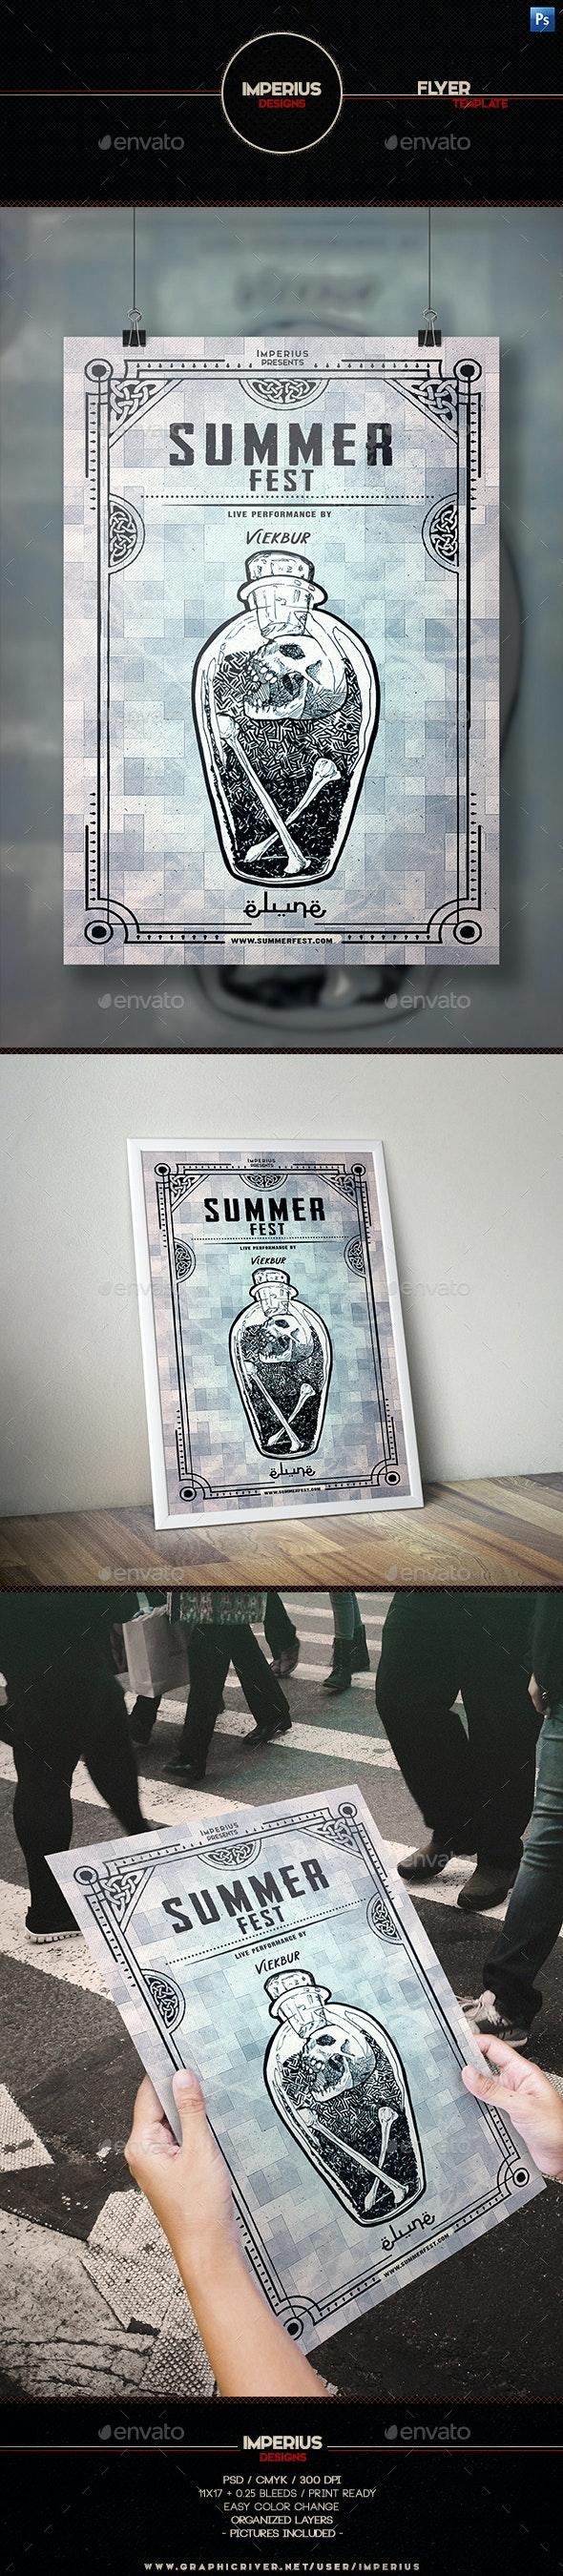 Summer Fest Flyer Template - Clubs & Parties Events